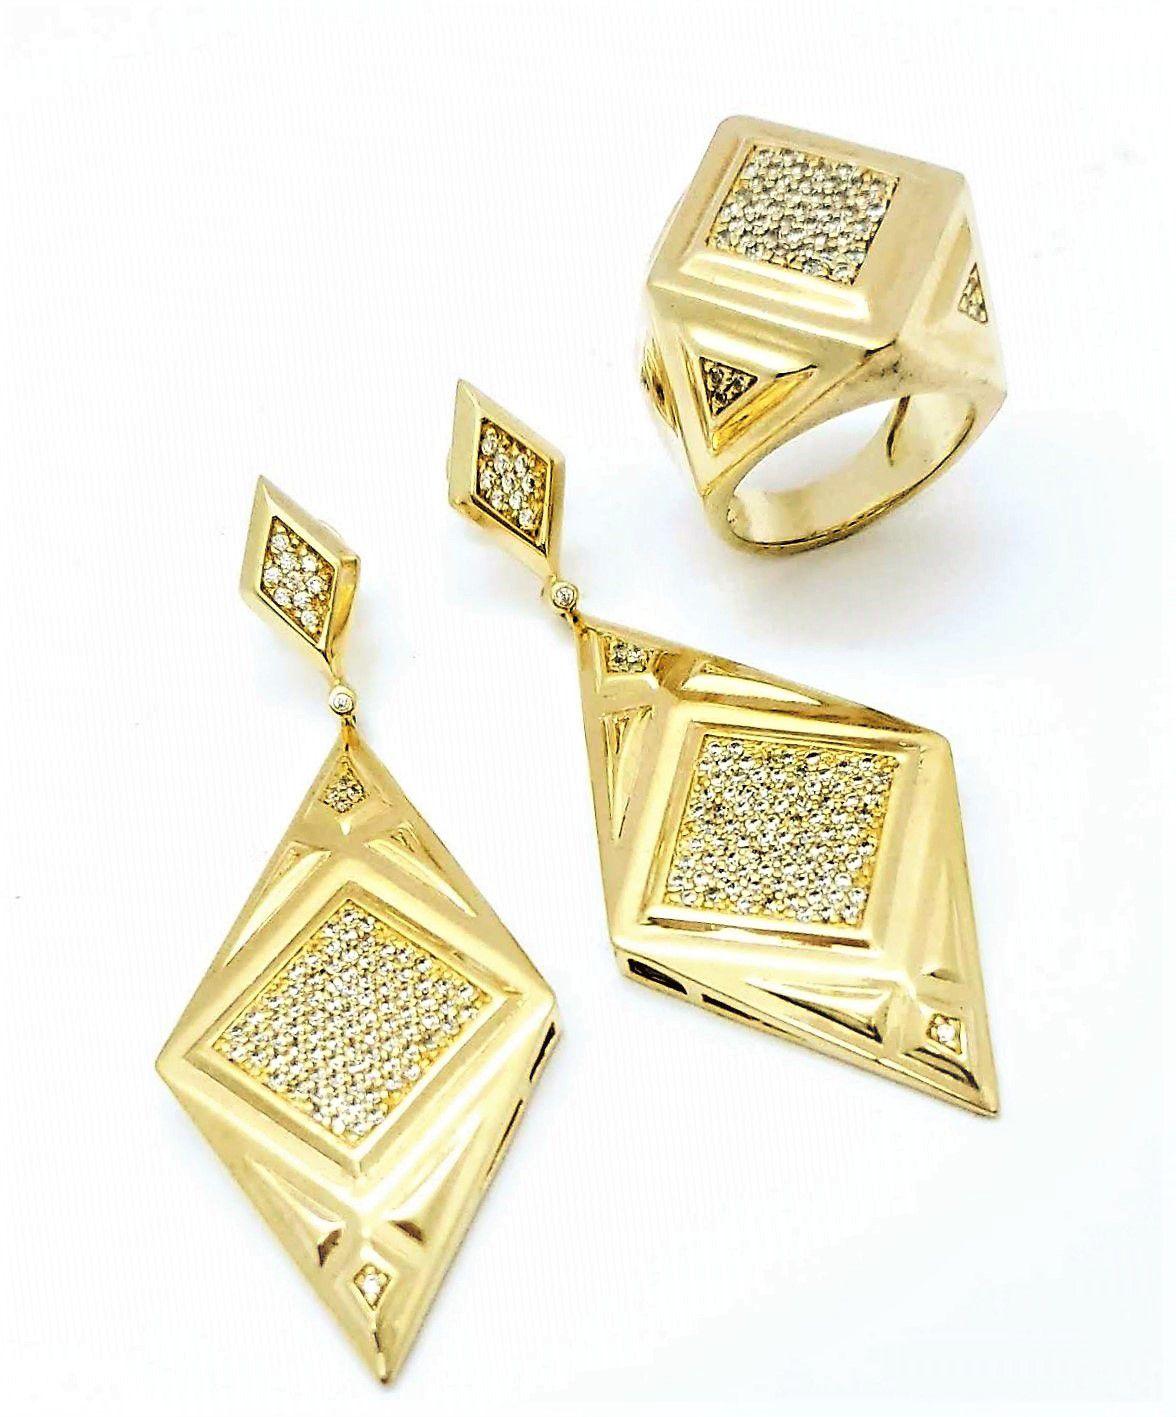 Anel e Brincos Dimensions Cravejados De Zirconia Banho De Ouro 18k 754 755